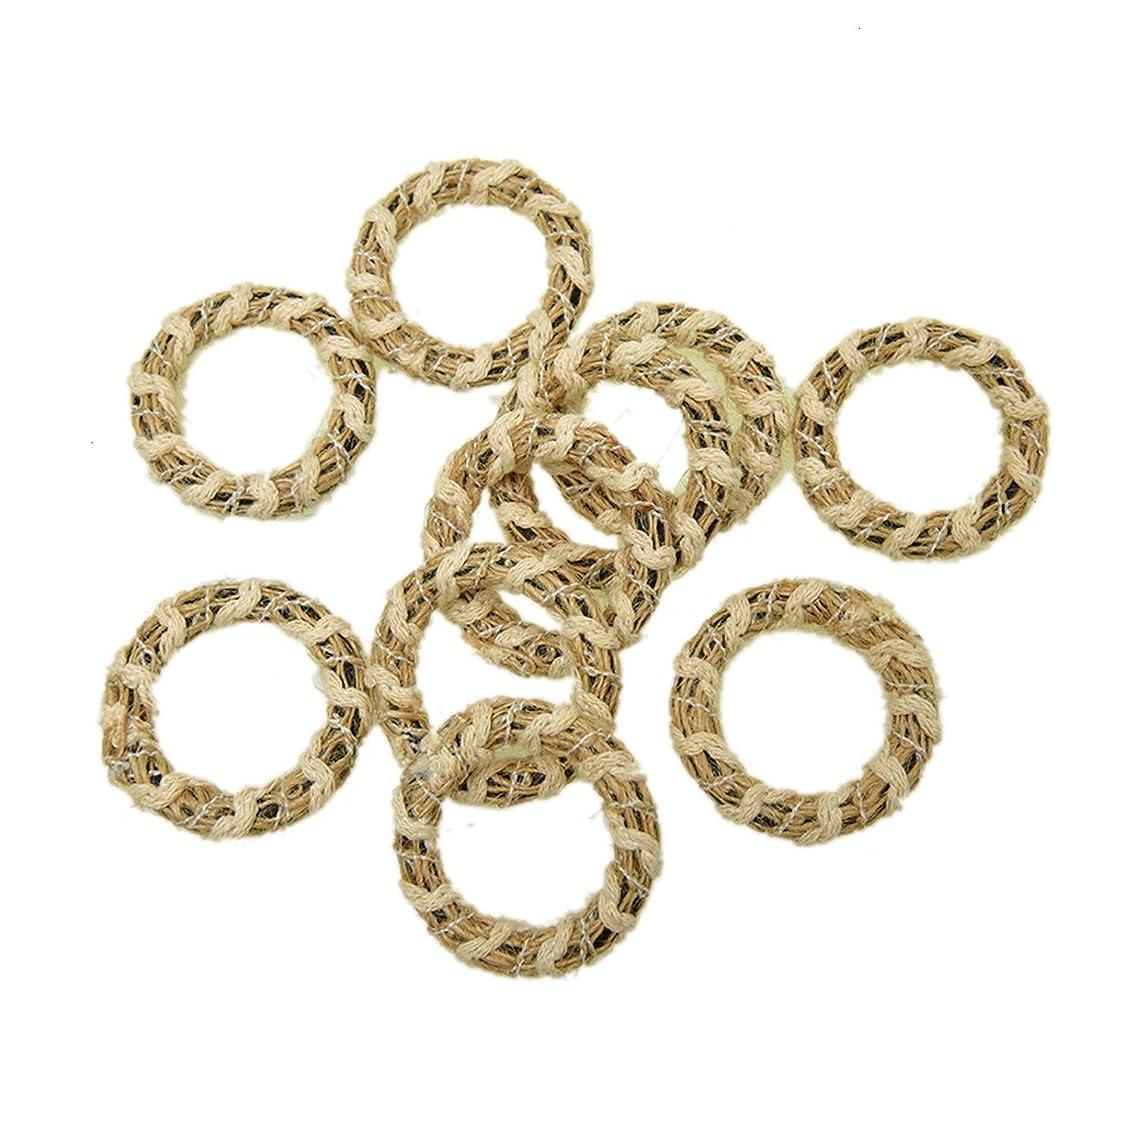 Monrocco 10Pcs Geometric Charms Burlap Jute Hemp Wire Line Circle Charm Pendant for Jewelry Making Earring DIY Craft